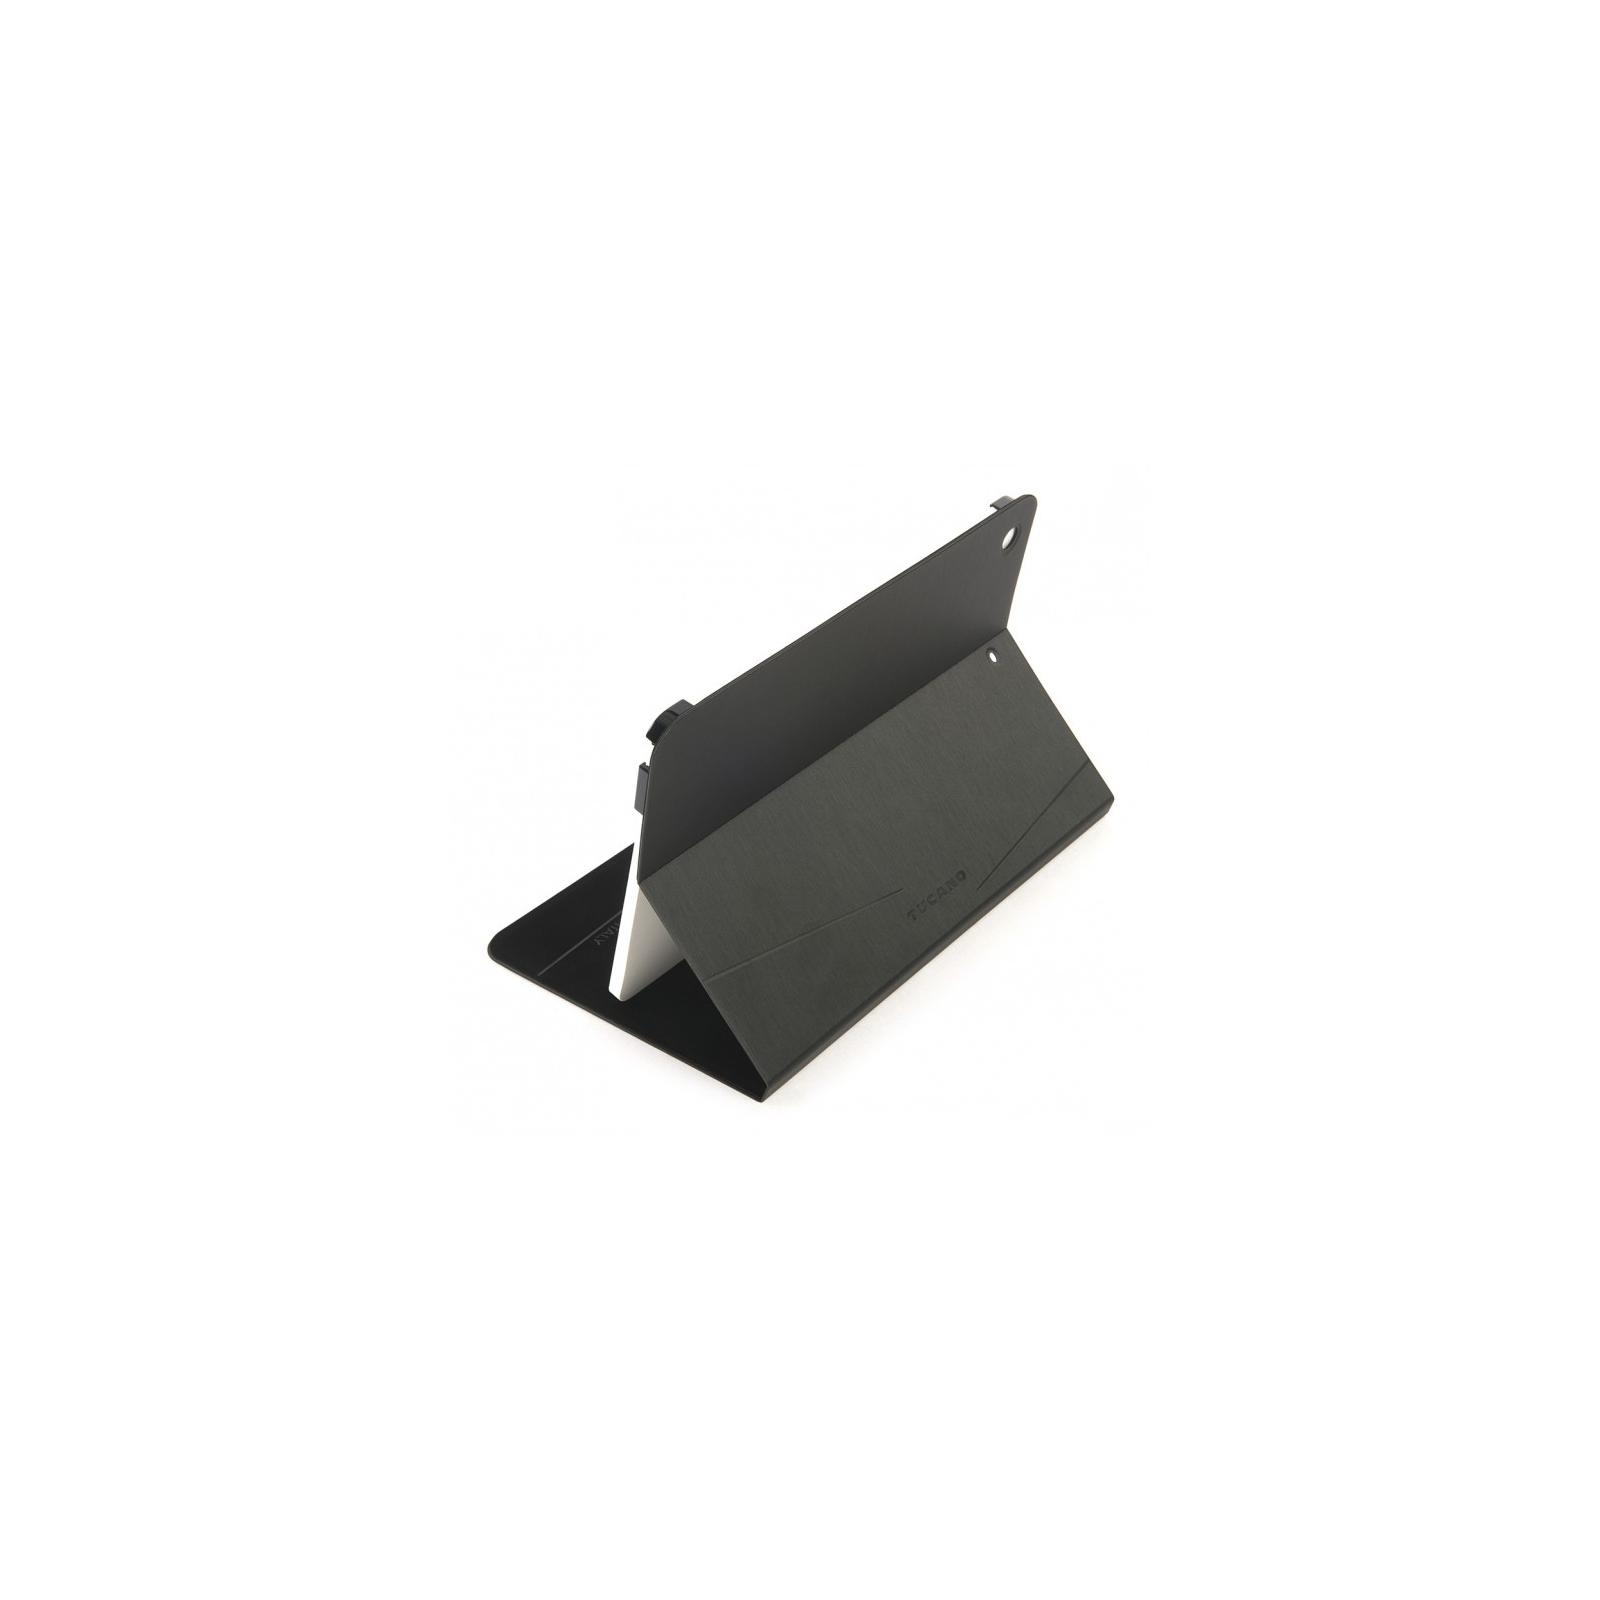 Чехол для планшета Tucano iPad Air Filo Black (IPD5FI) изображение 6